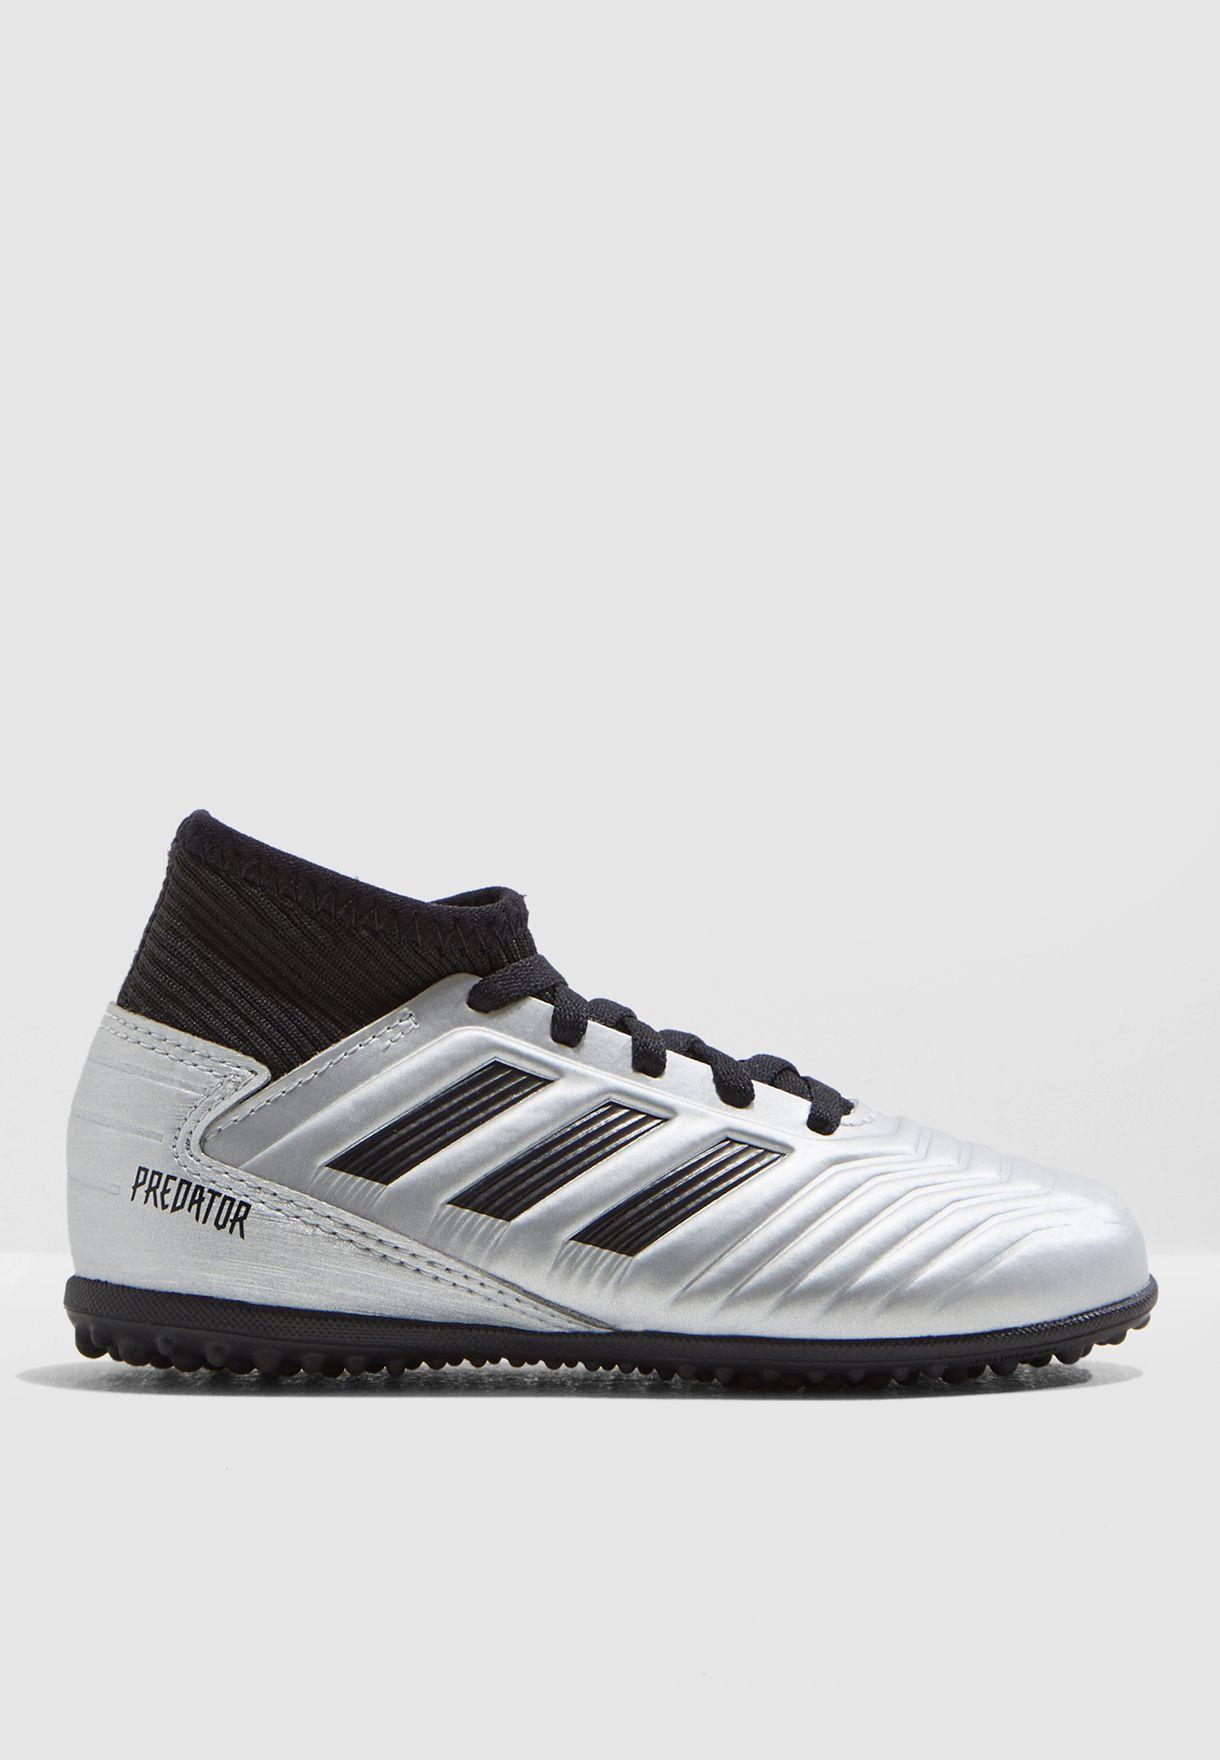 حذاء بريداتور 19.3